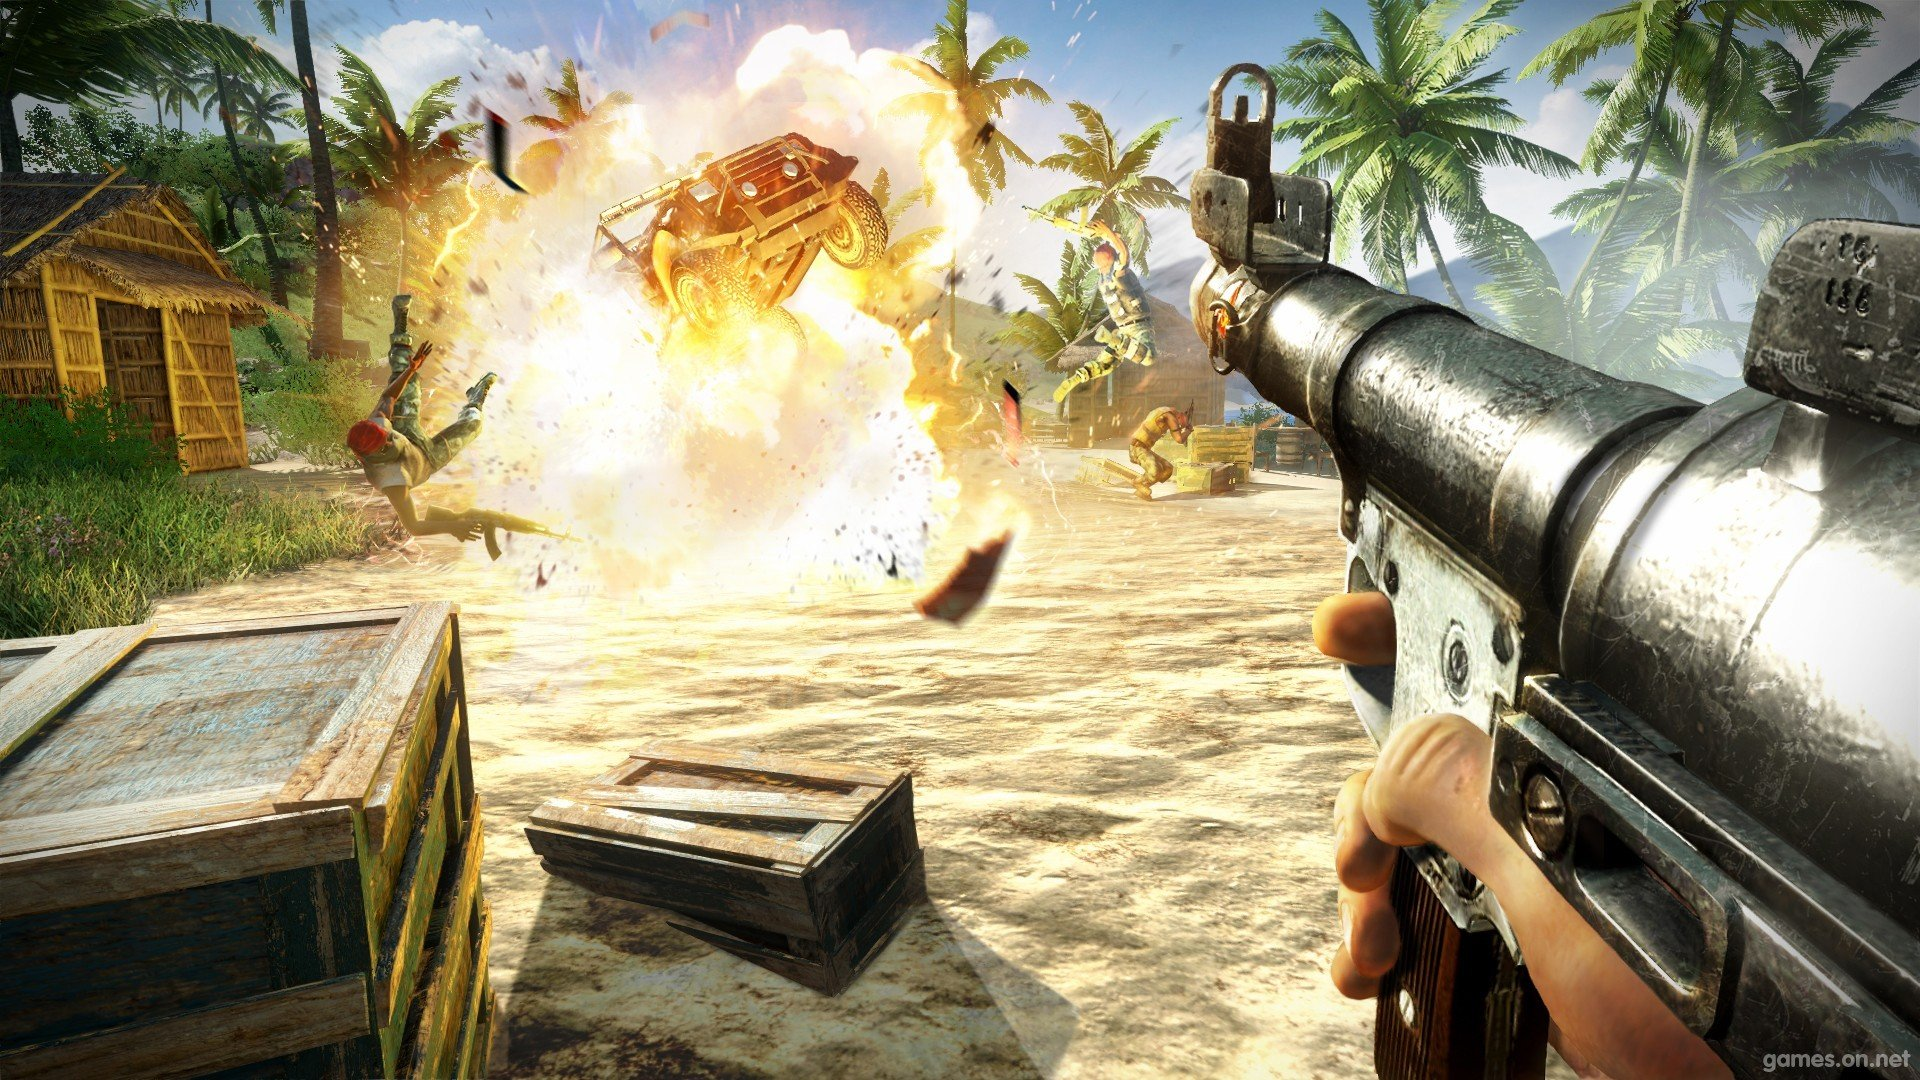 Free Far Cry 3 High Quality Wallpaper Id 282499 For Hd 1080p Desktop